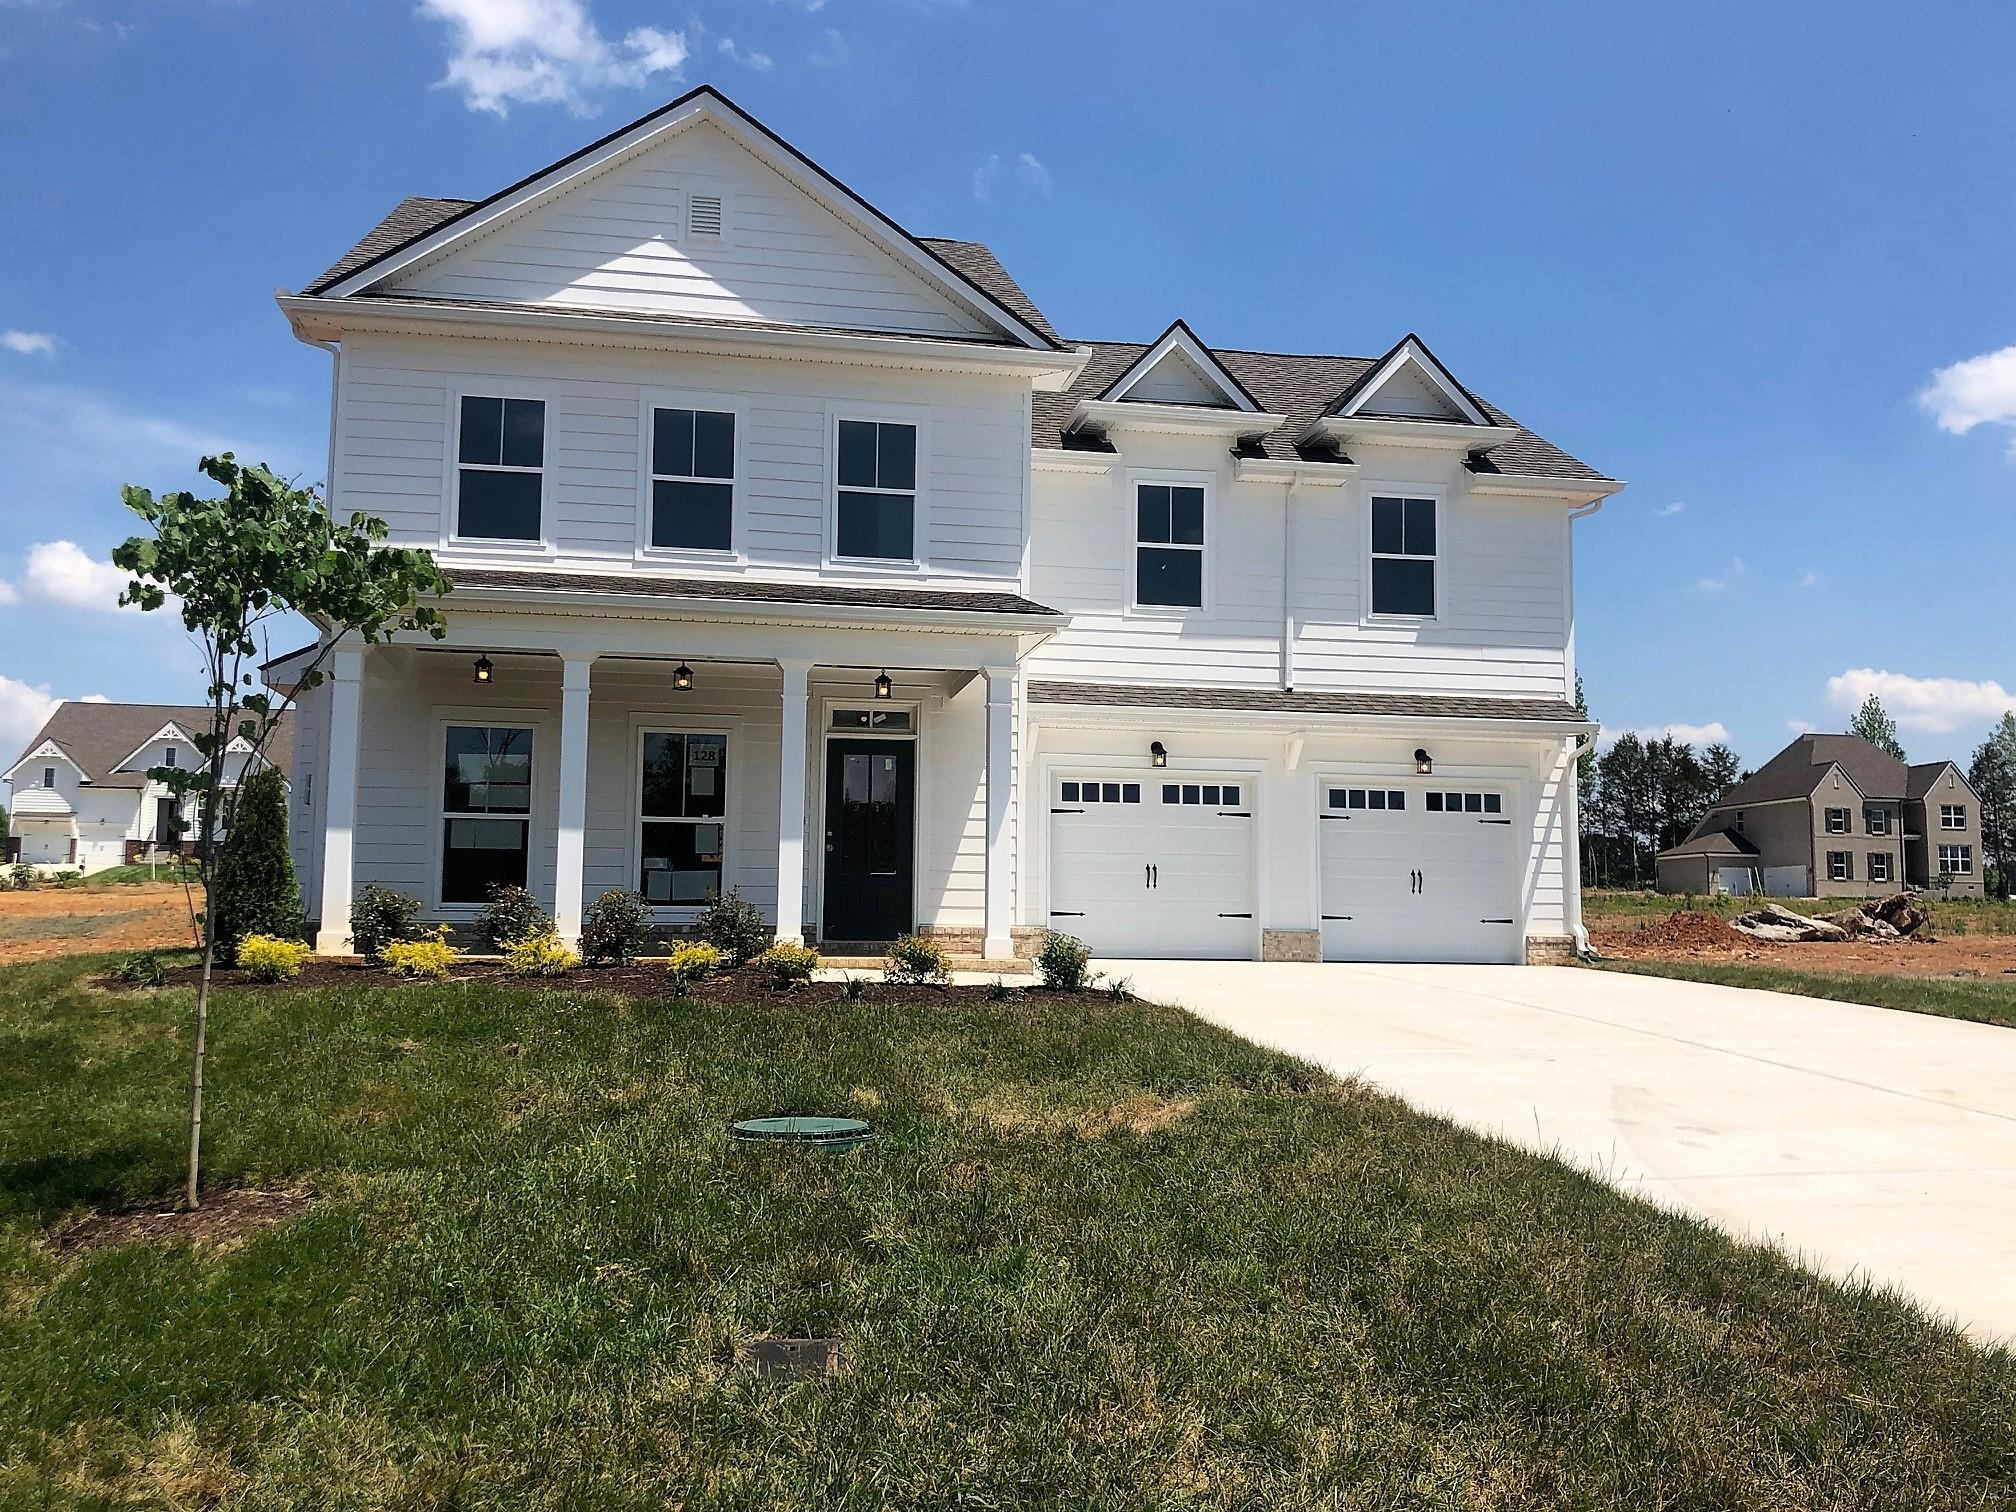 1239 Proprietors Place #128, Murfreesboro, Tennessee